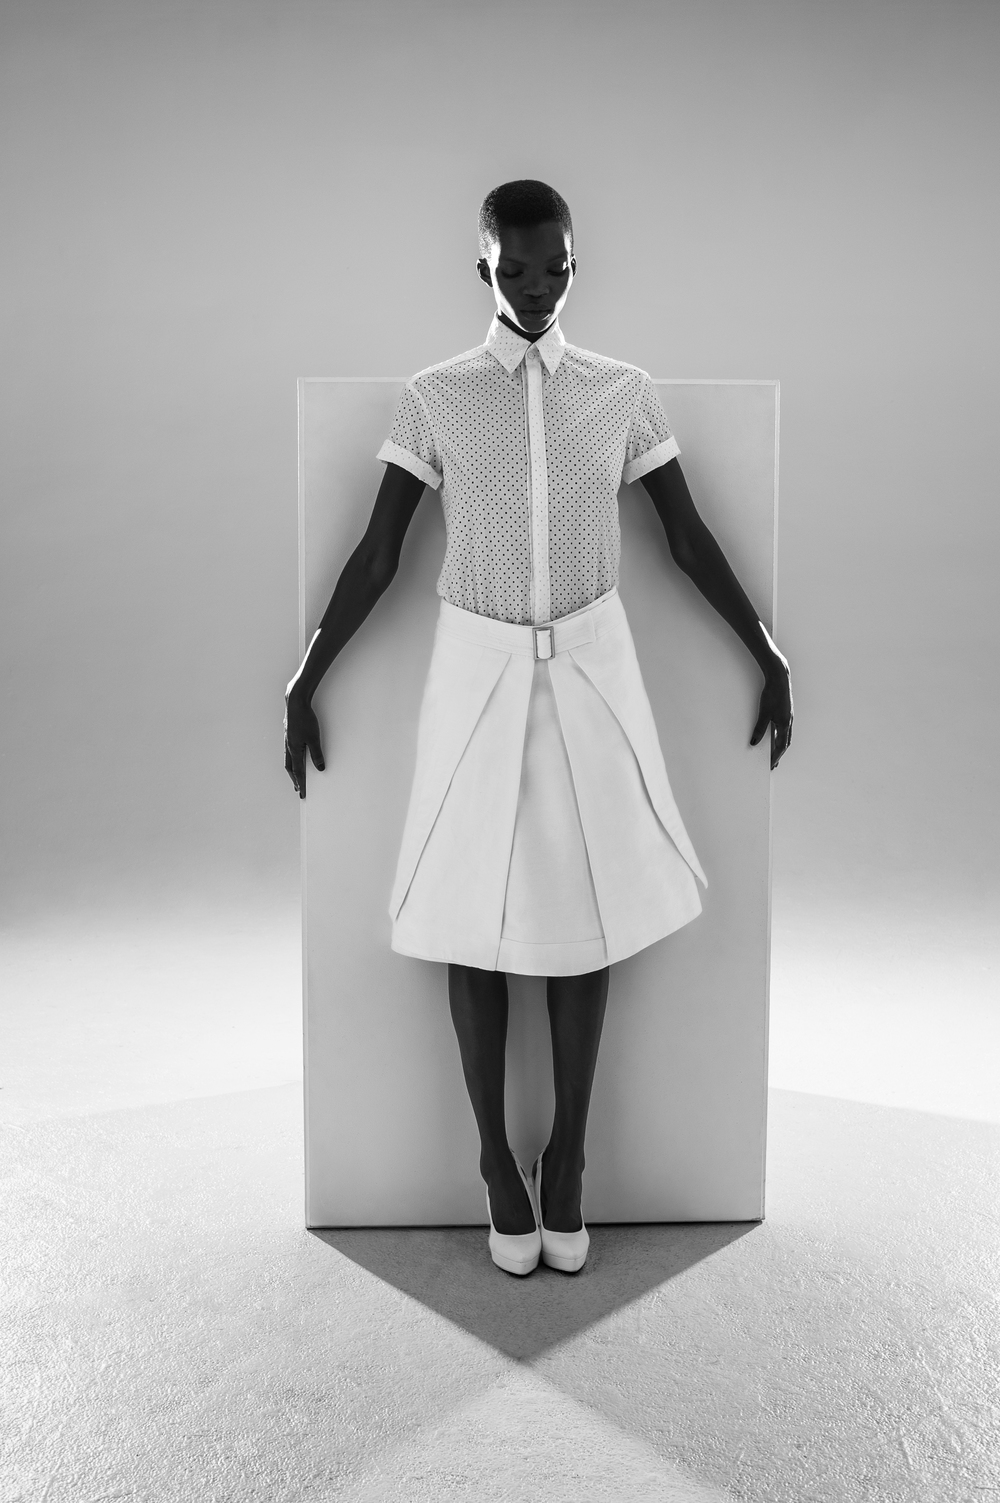 Shirt by Pheobe Wang, BFA Fashion Design. Skirt by Stephina Touch, MFA Fashion Design.